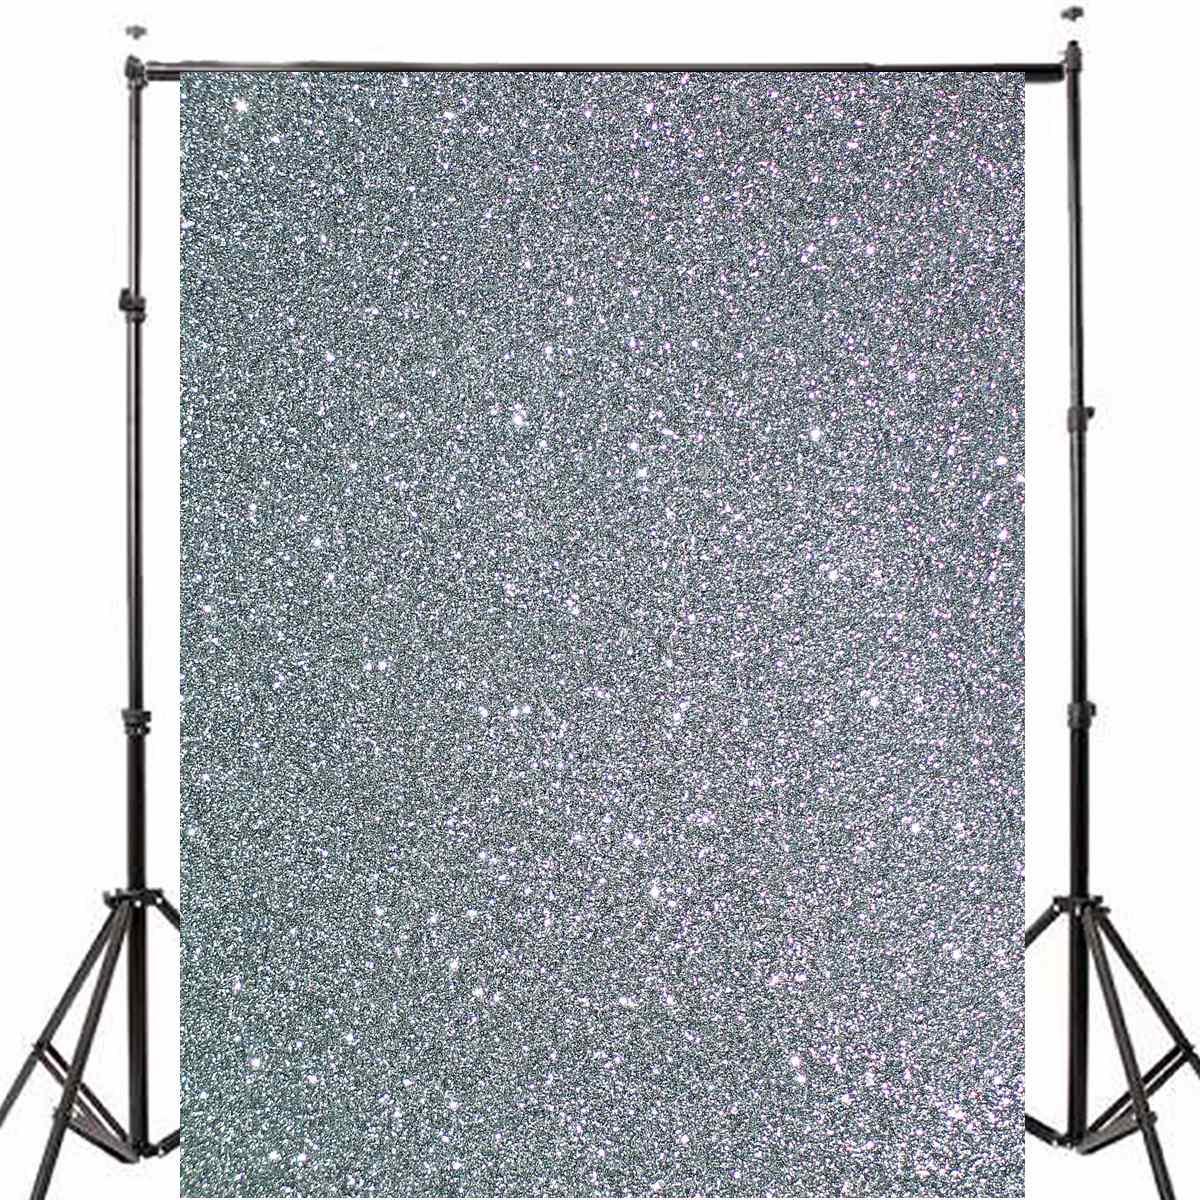 Freya 150x210cm prata cor fotografia fundo estúdio prop retrato pano de fundo foto tiro fotográfico volta gota para estúdio